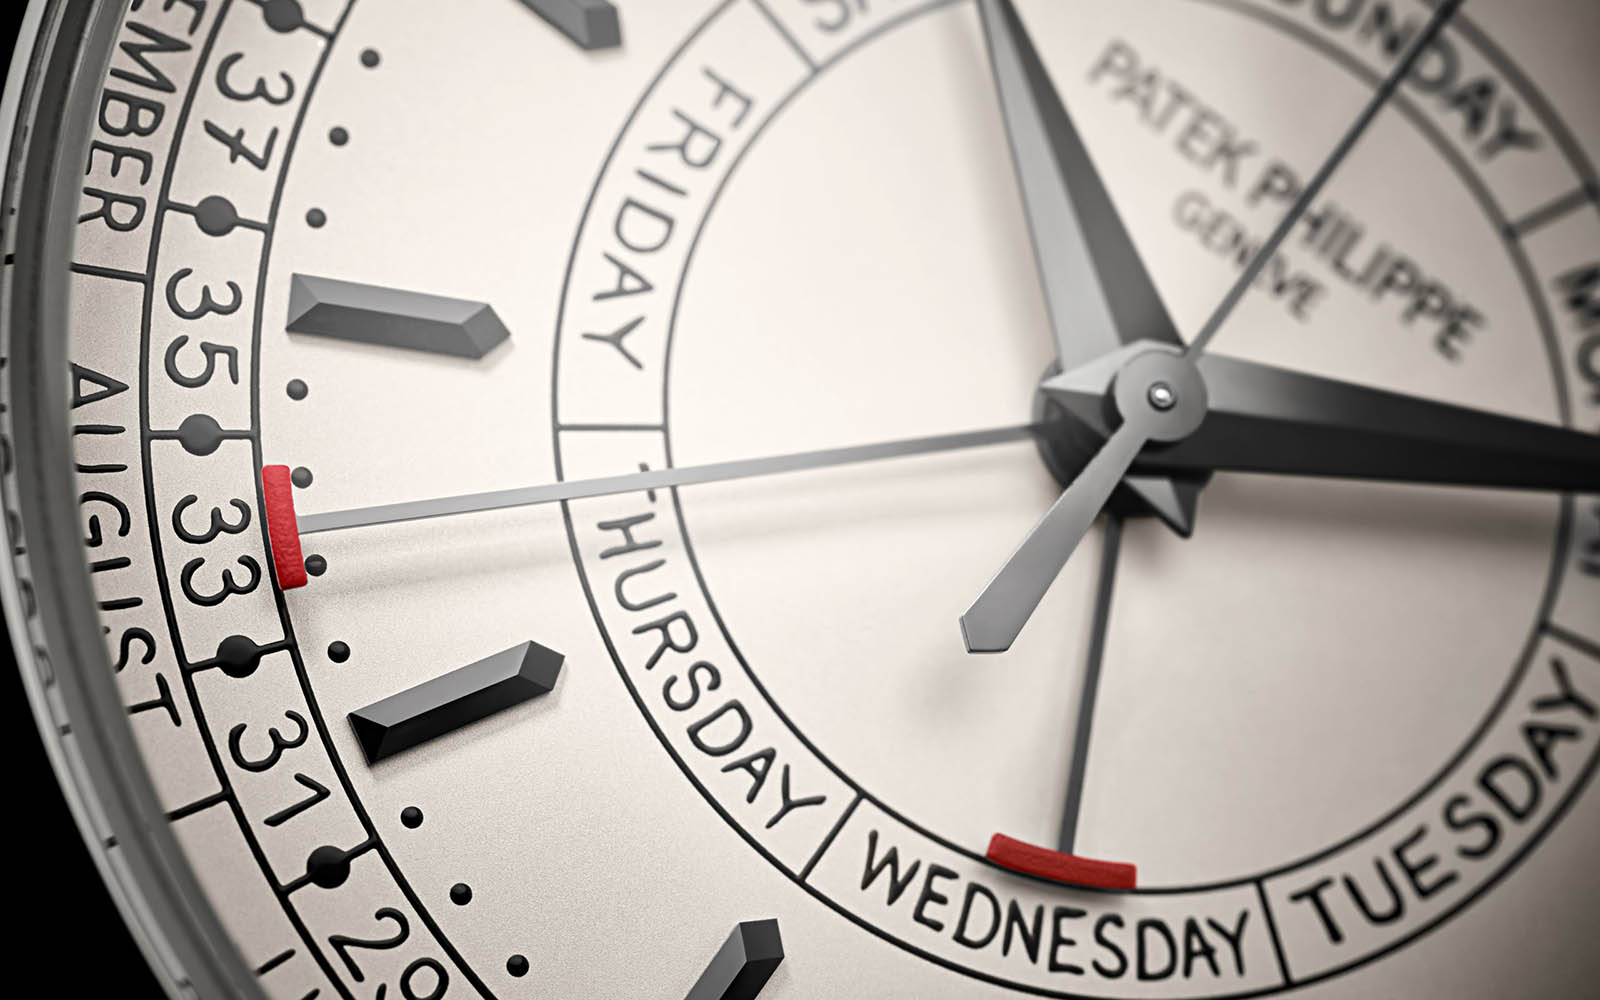 Patek Philippe ref. 5212A Calatrava Weekly Calendar 4